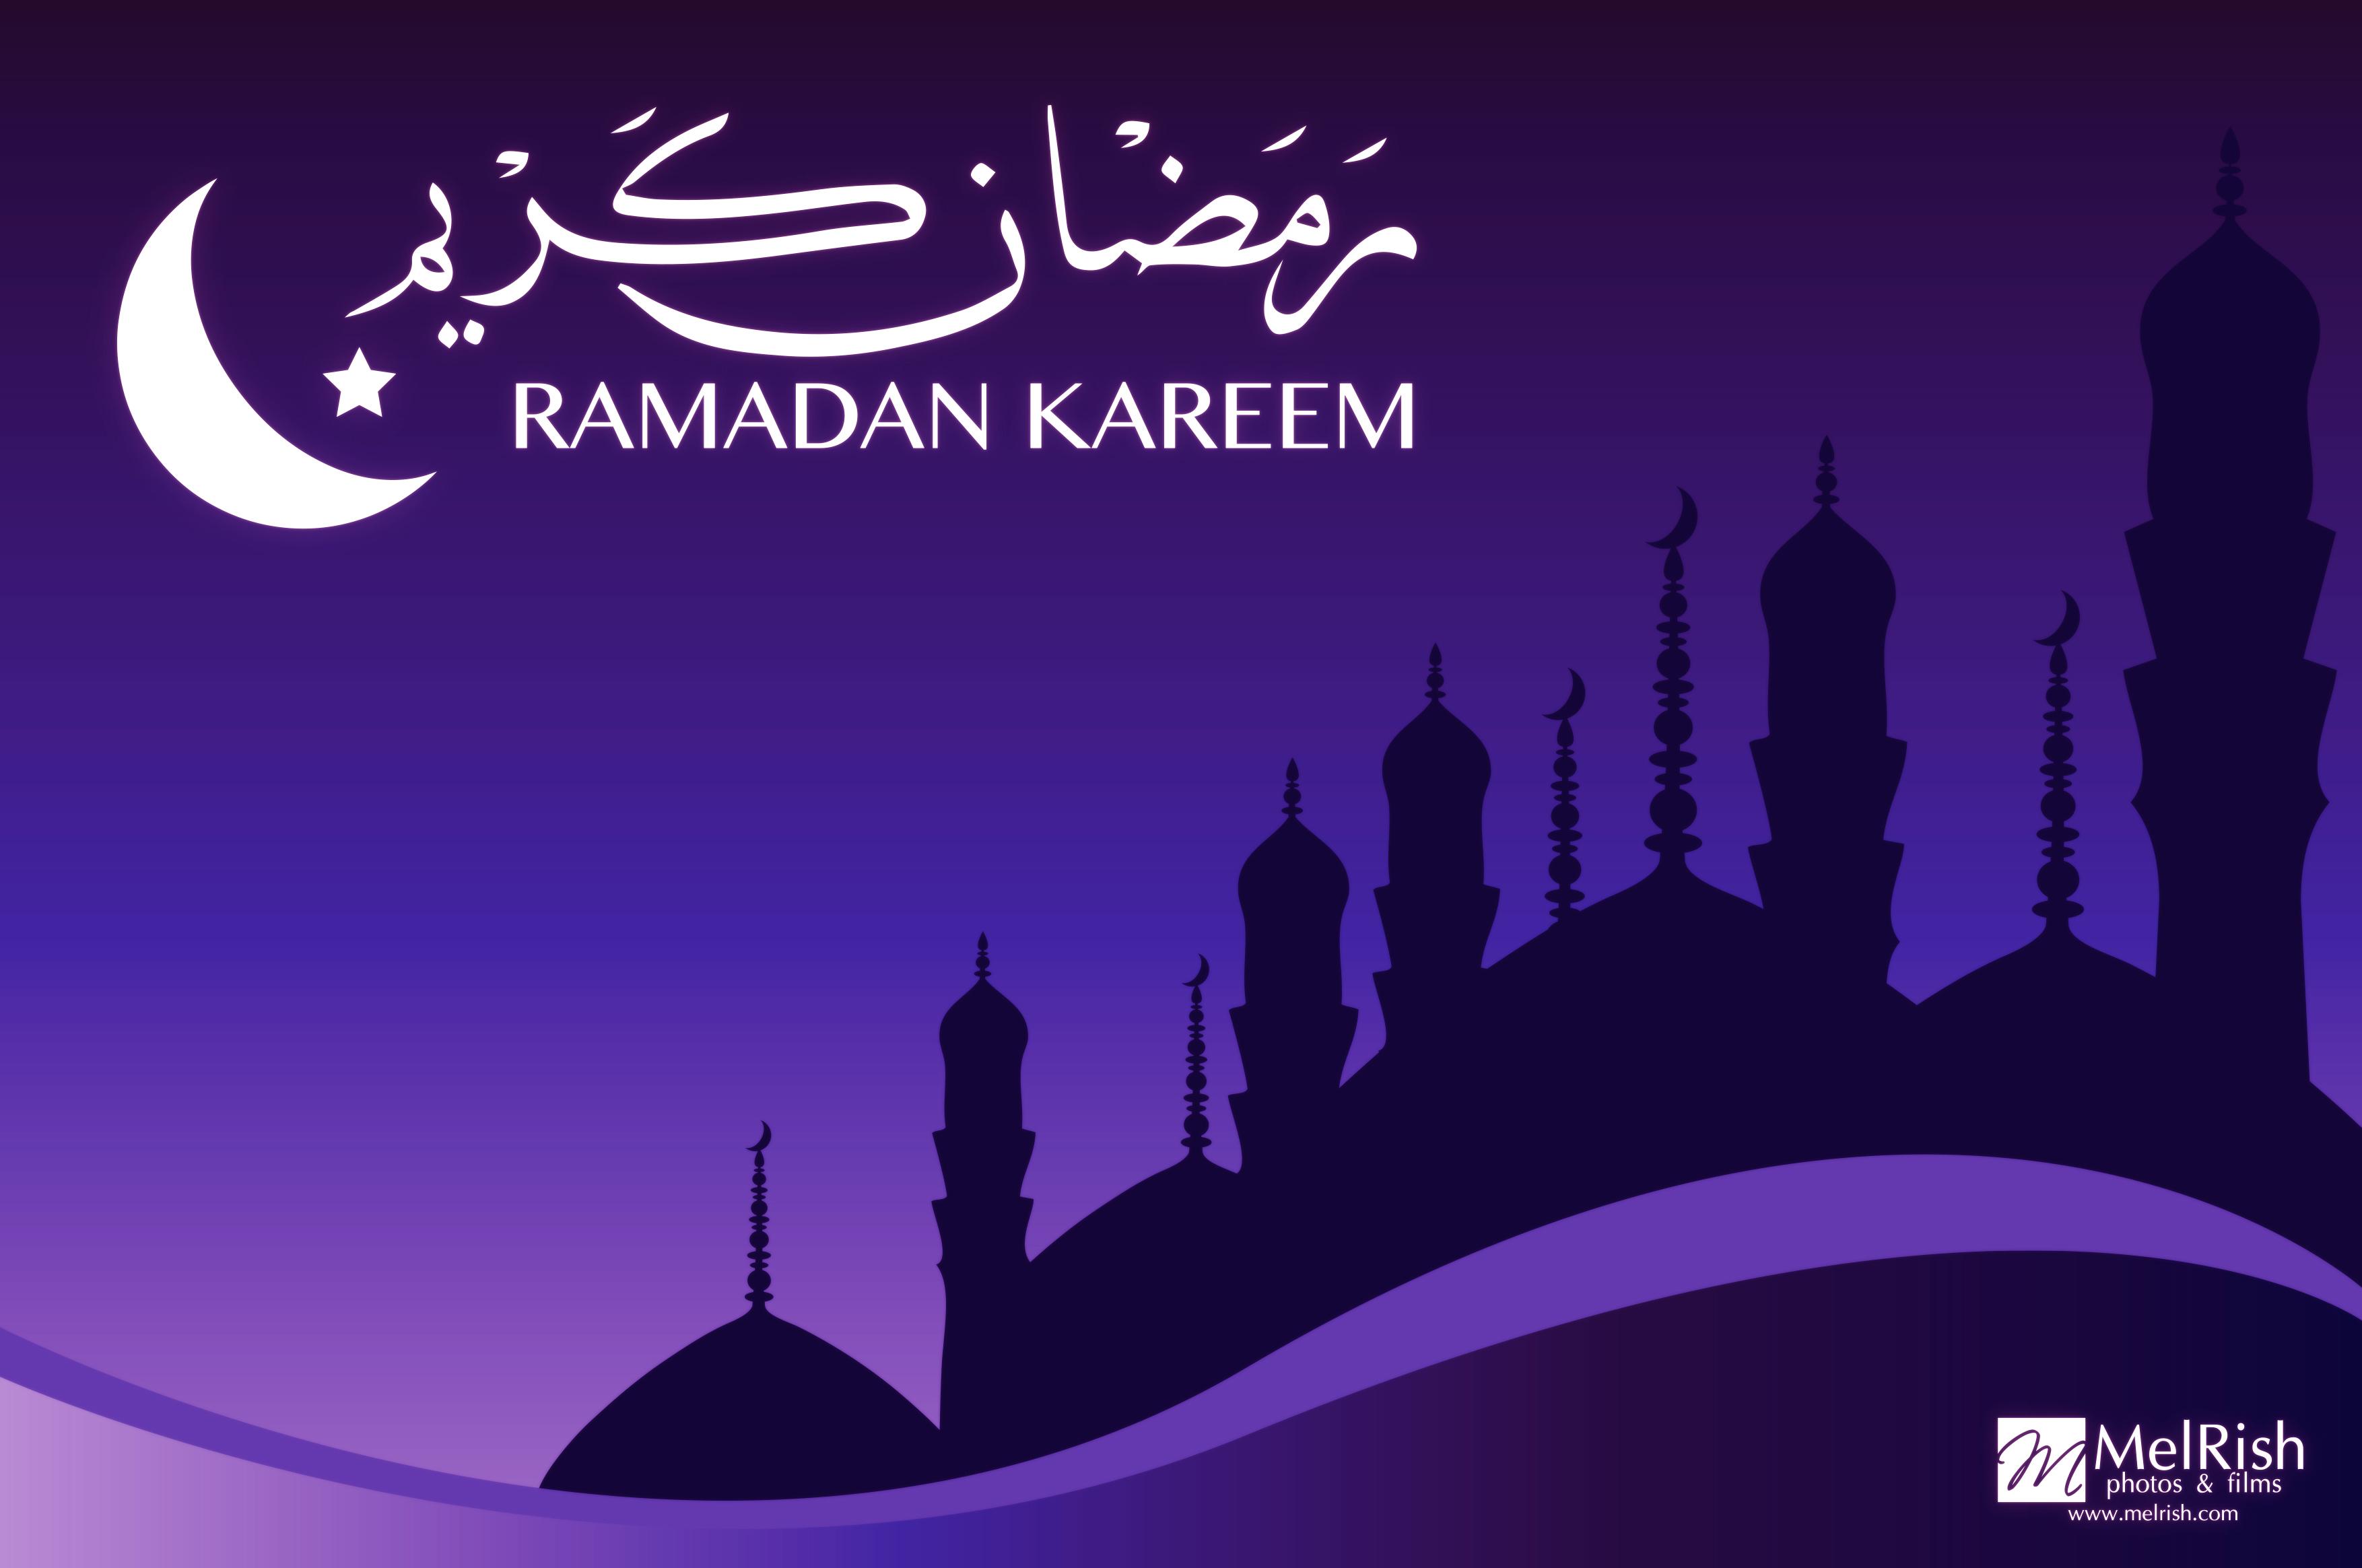 Ramadan Kareem information, Ramadan Kareem billeder, Ramadan Kareem ...